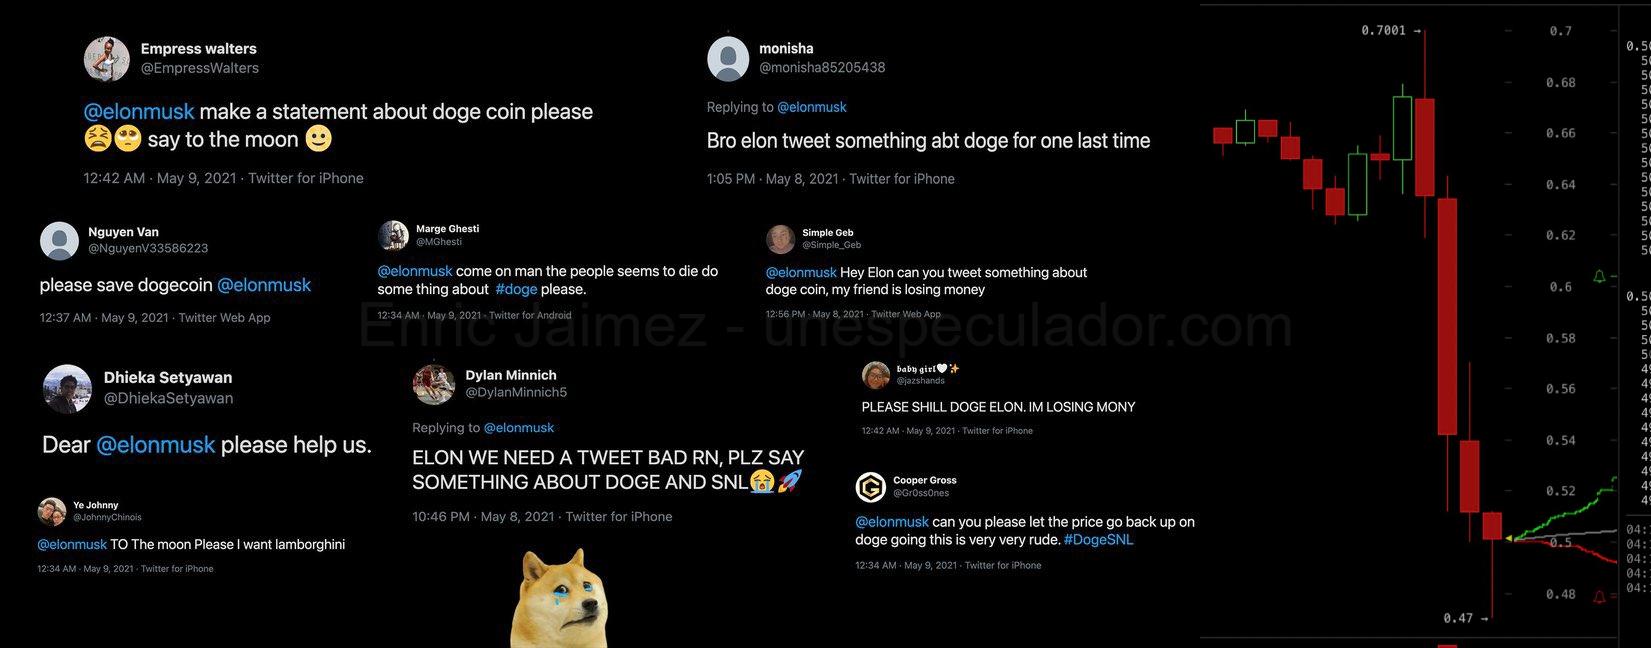 estafa criptomonedas - dogecoins